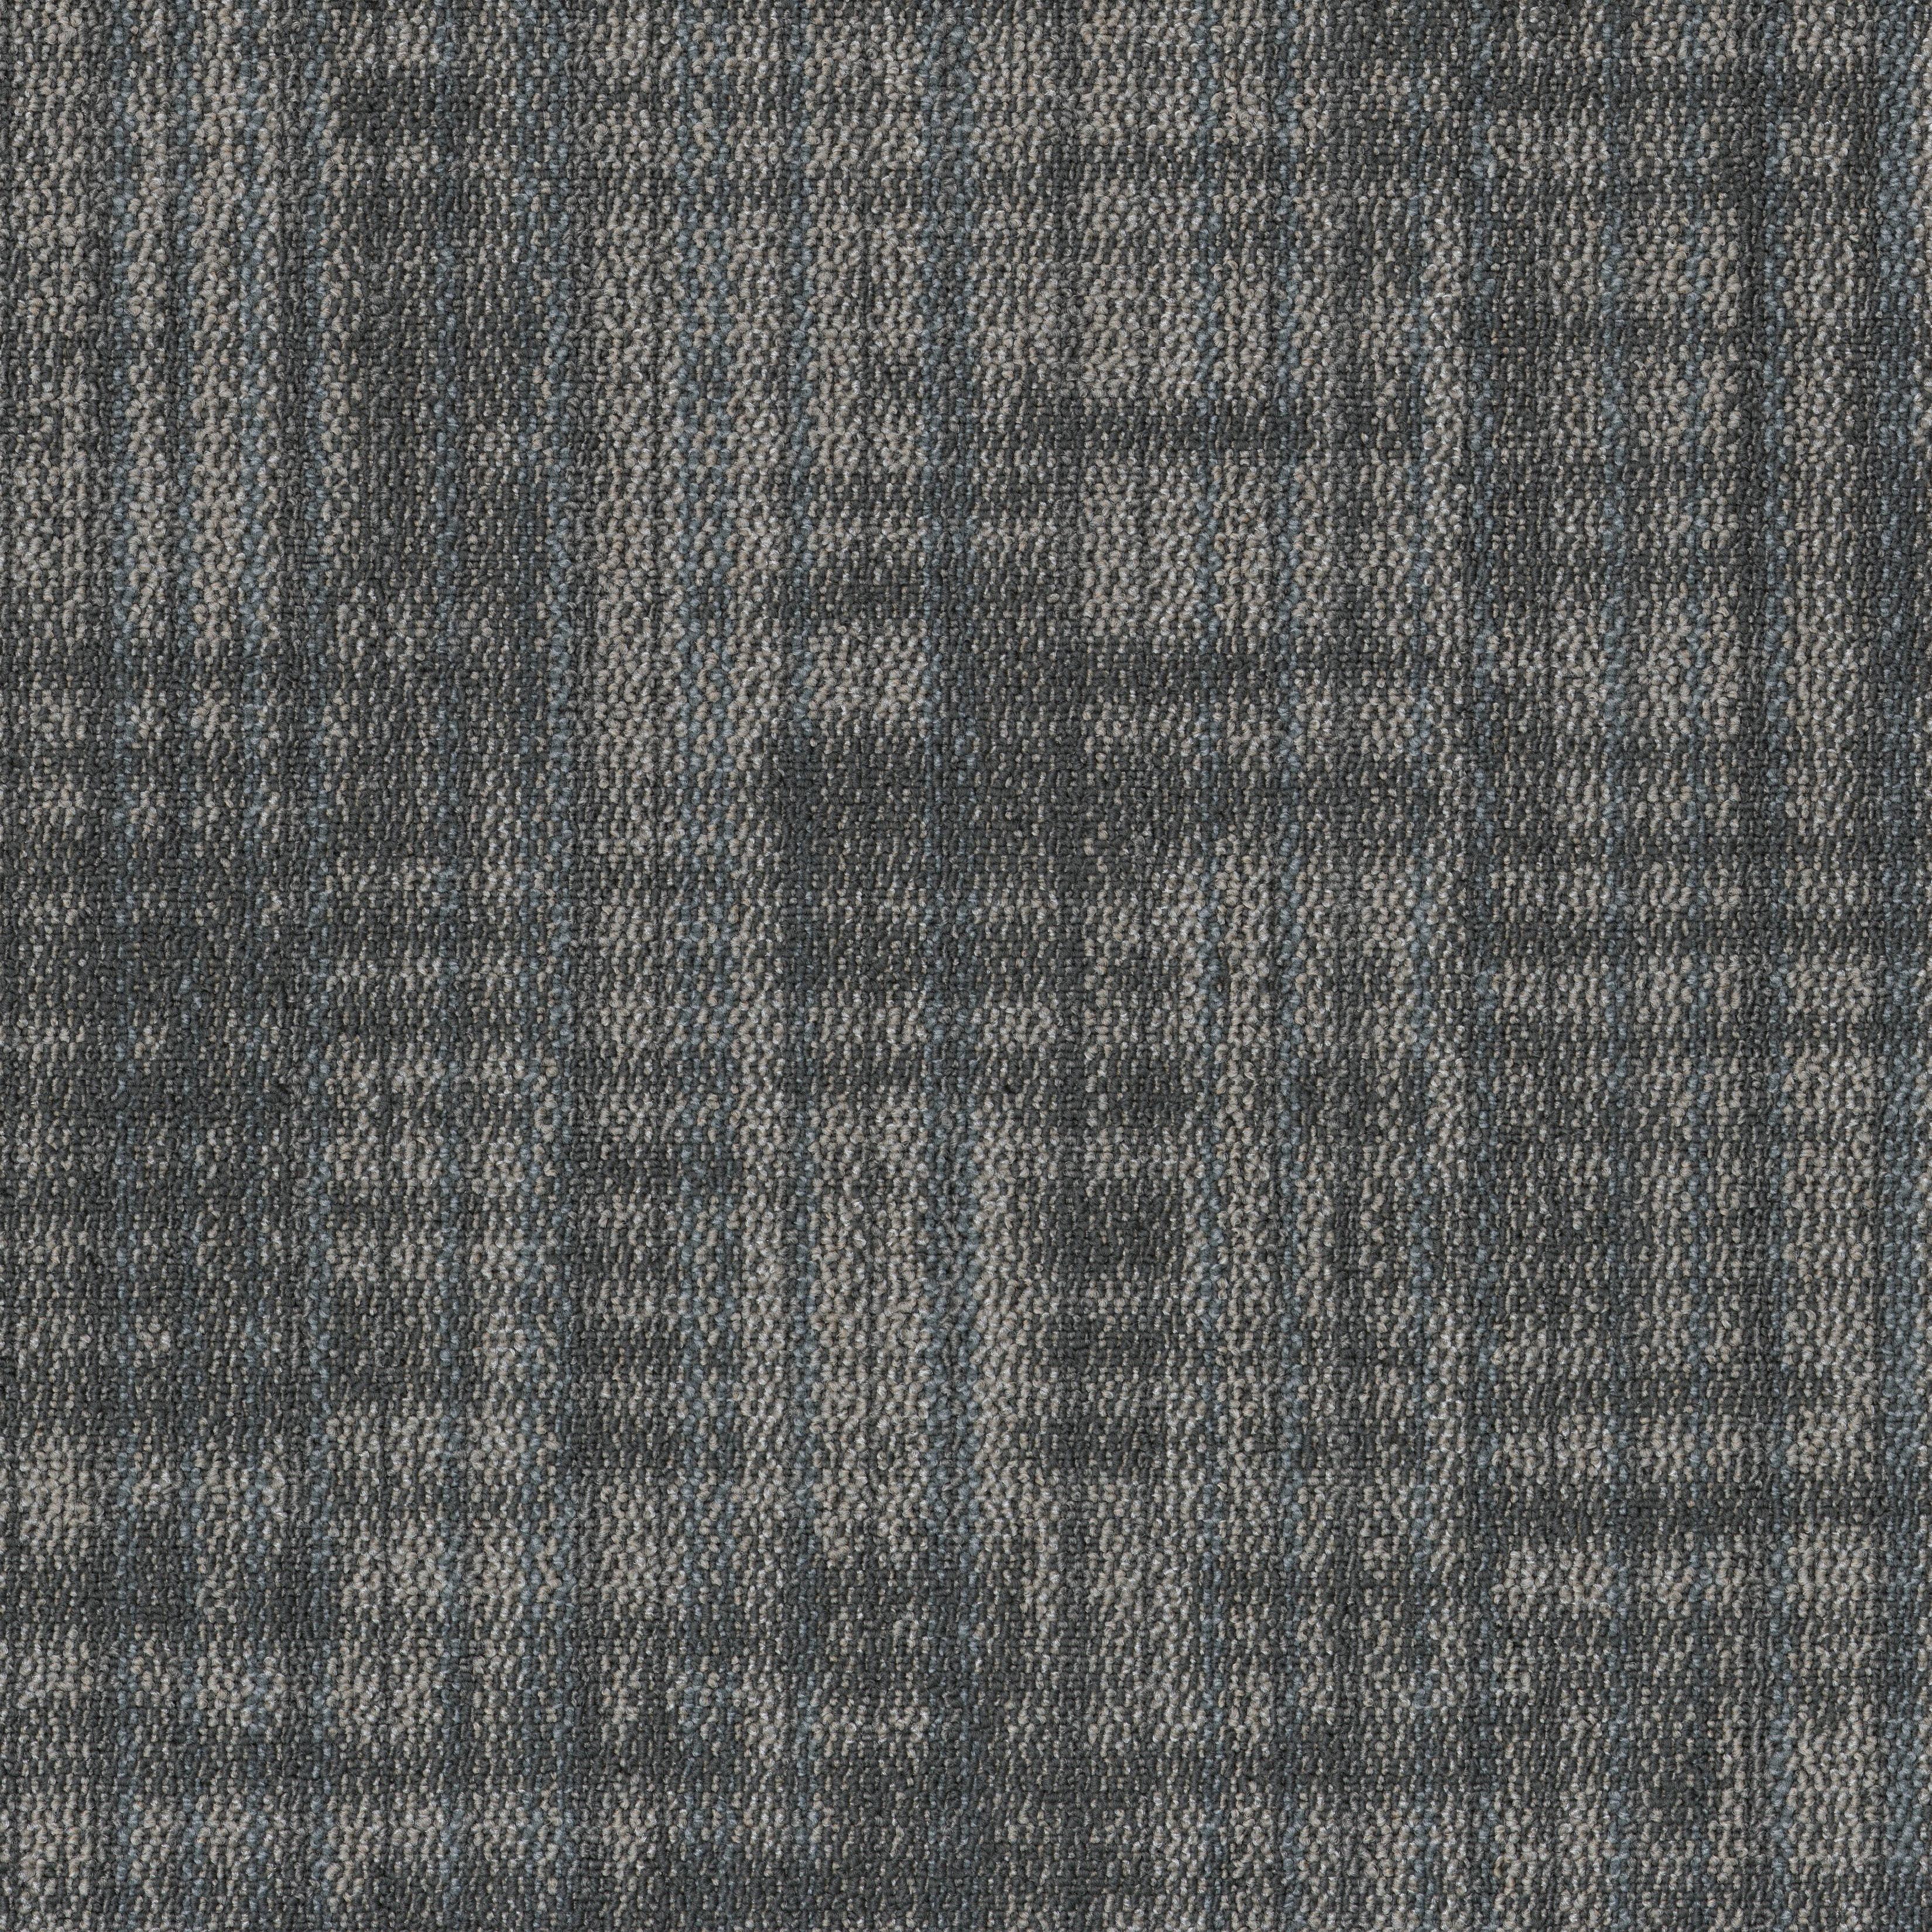 "Shaw Correspond Carpet Tile Alike 24"" x 24"" Premium(80 sq ft/ctn)"